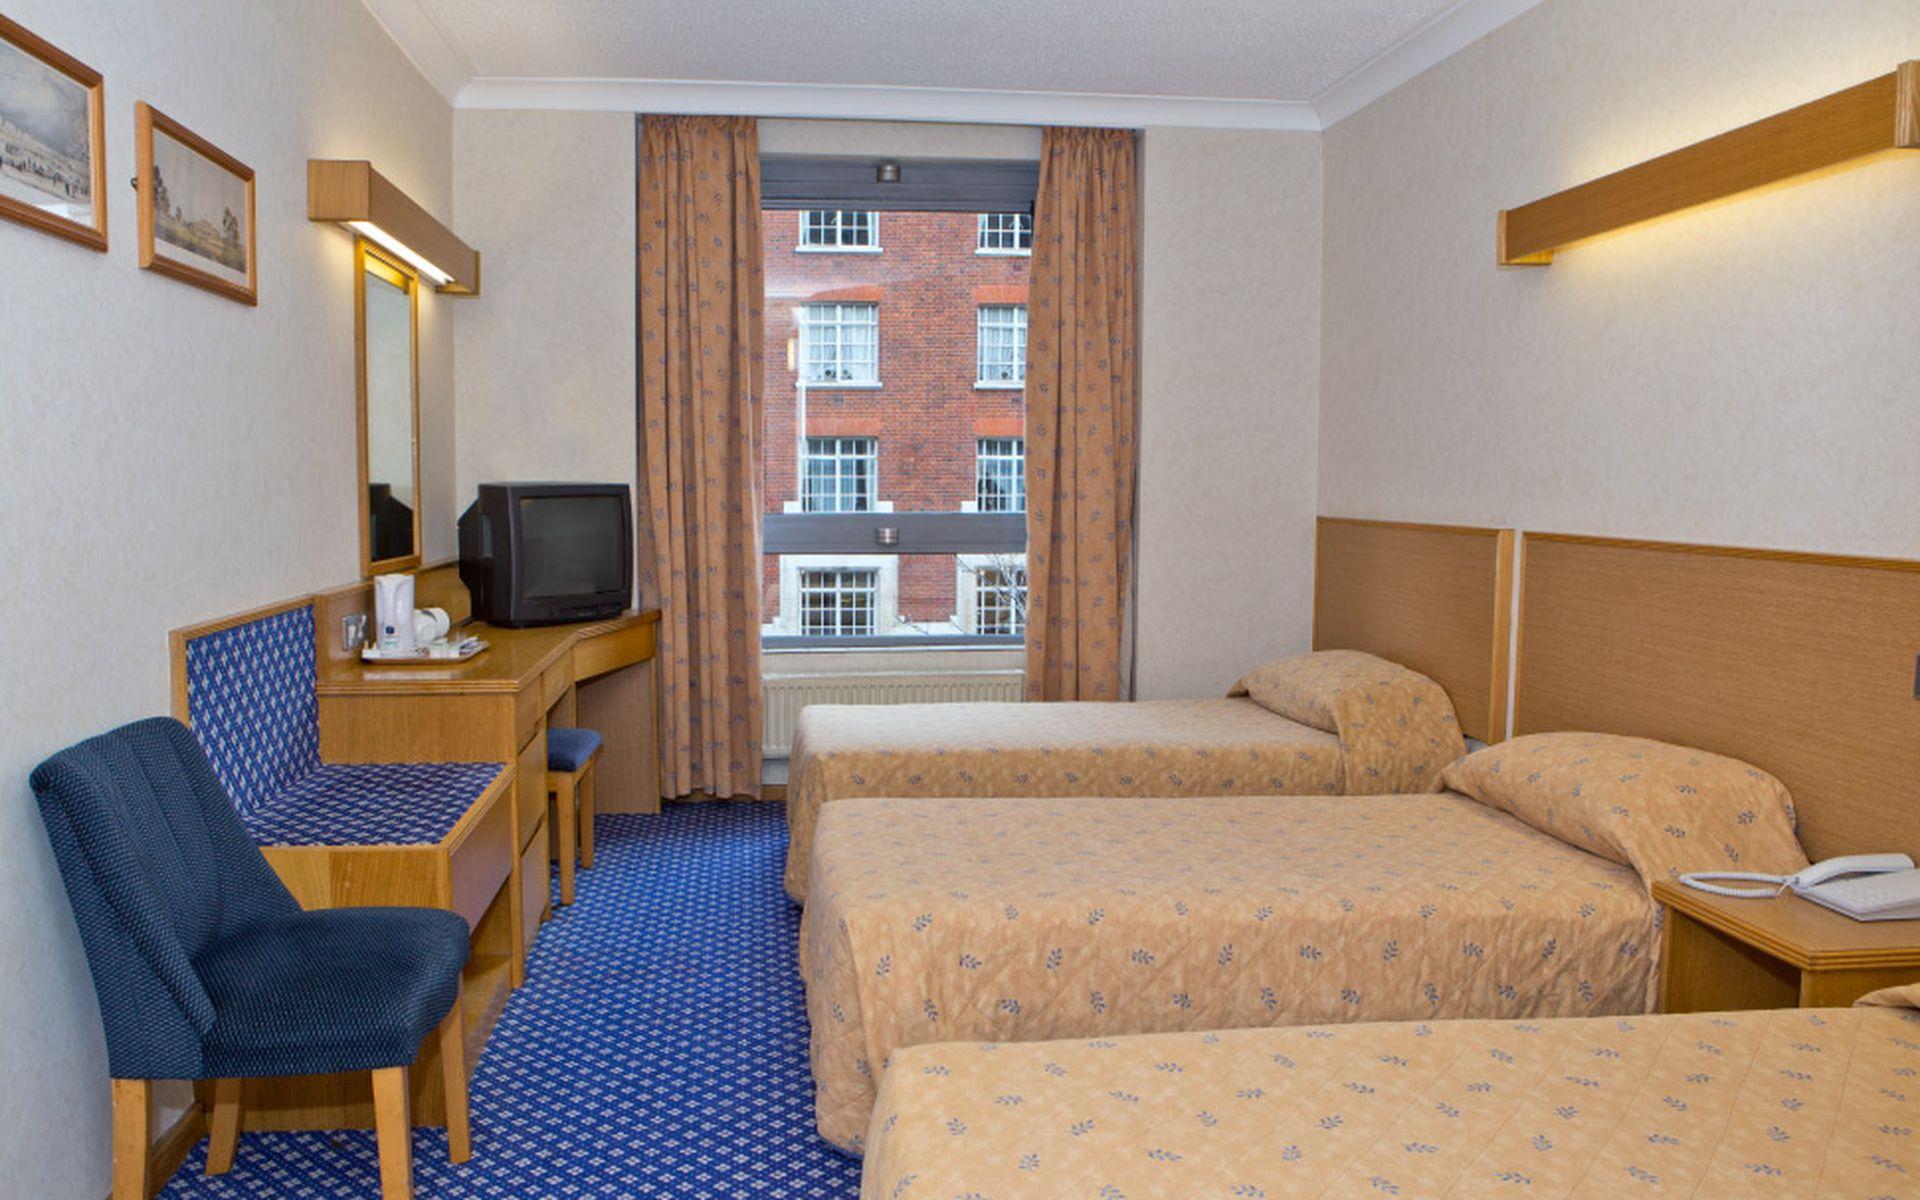 Hotel royal national london desde 59 logitravel for Hotel habitacion familiar londres